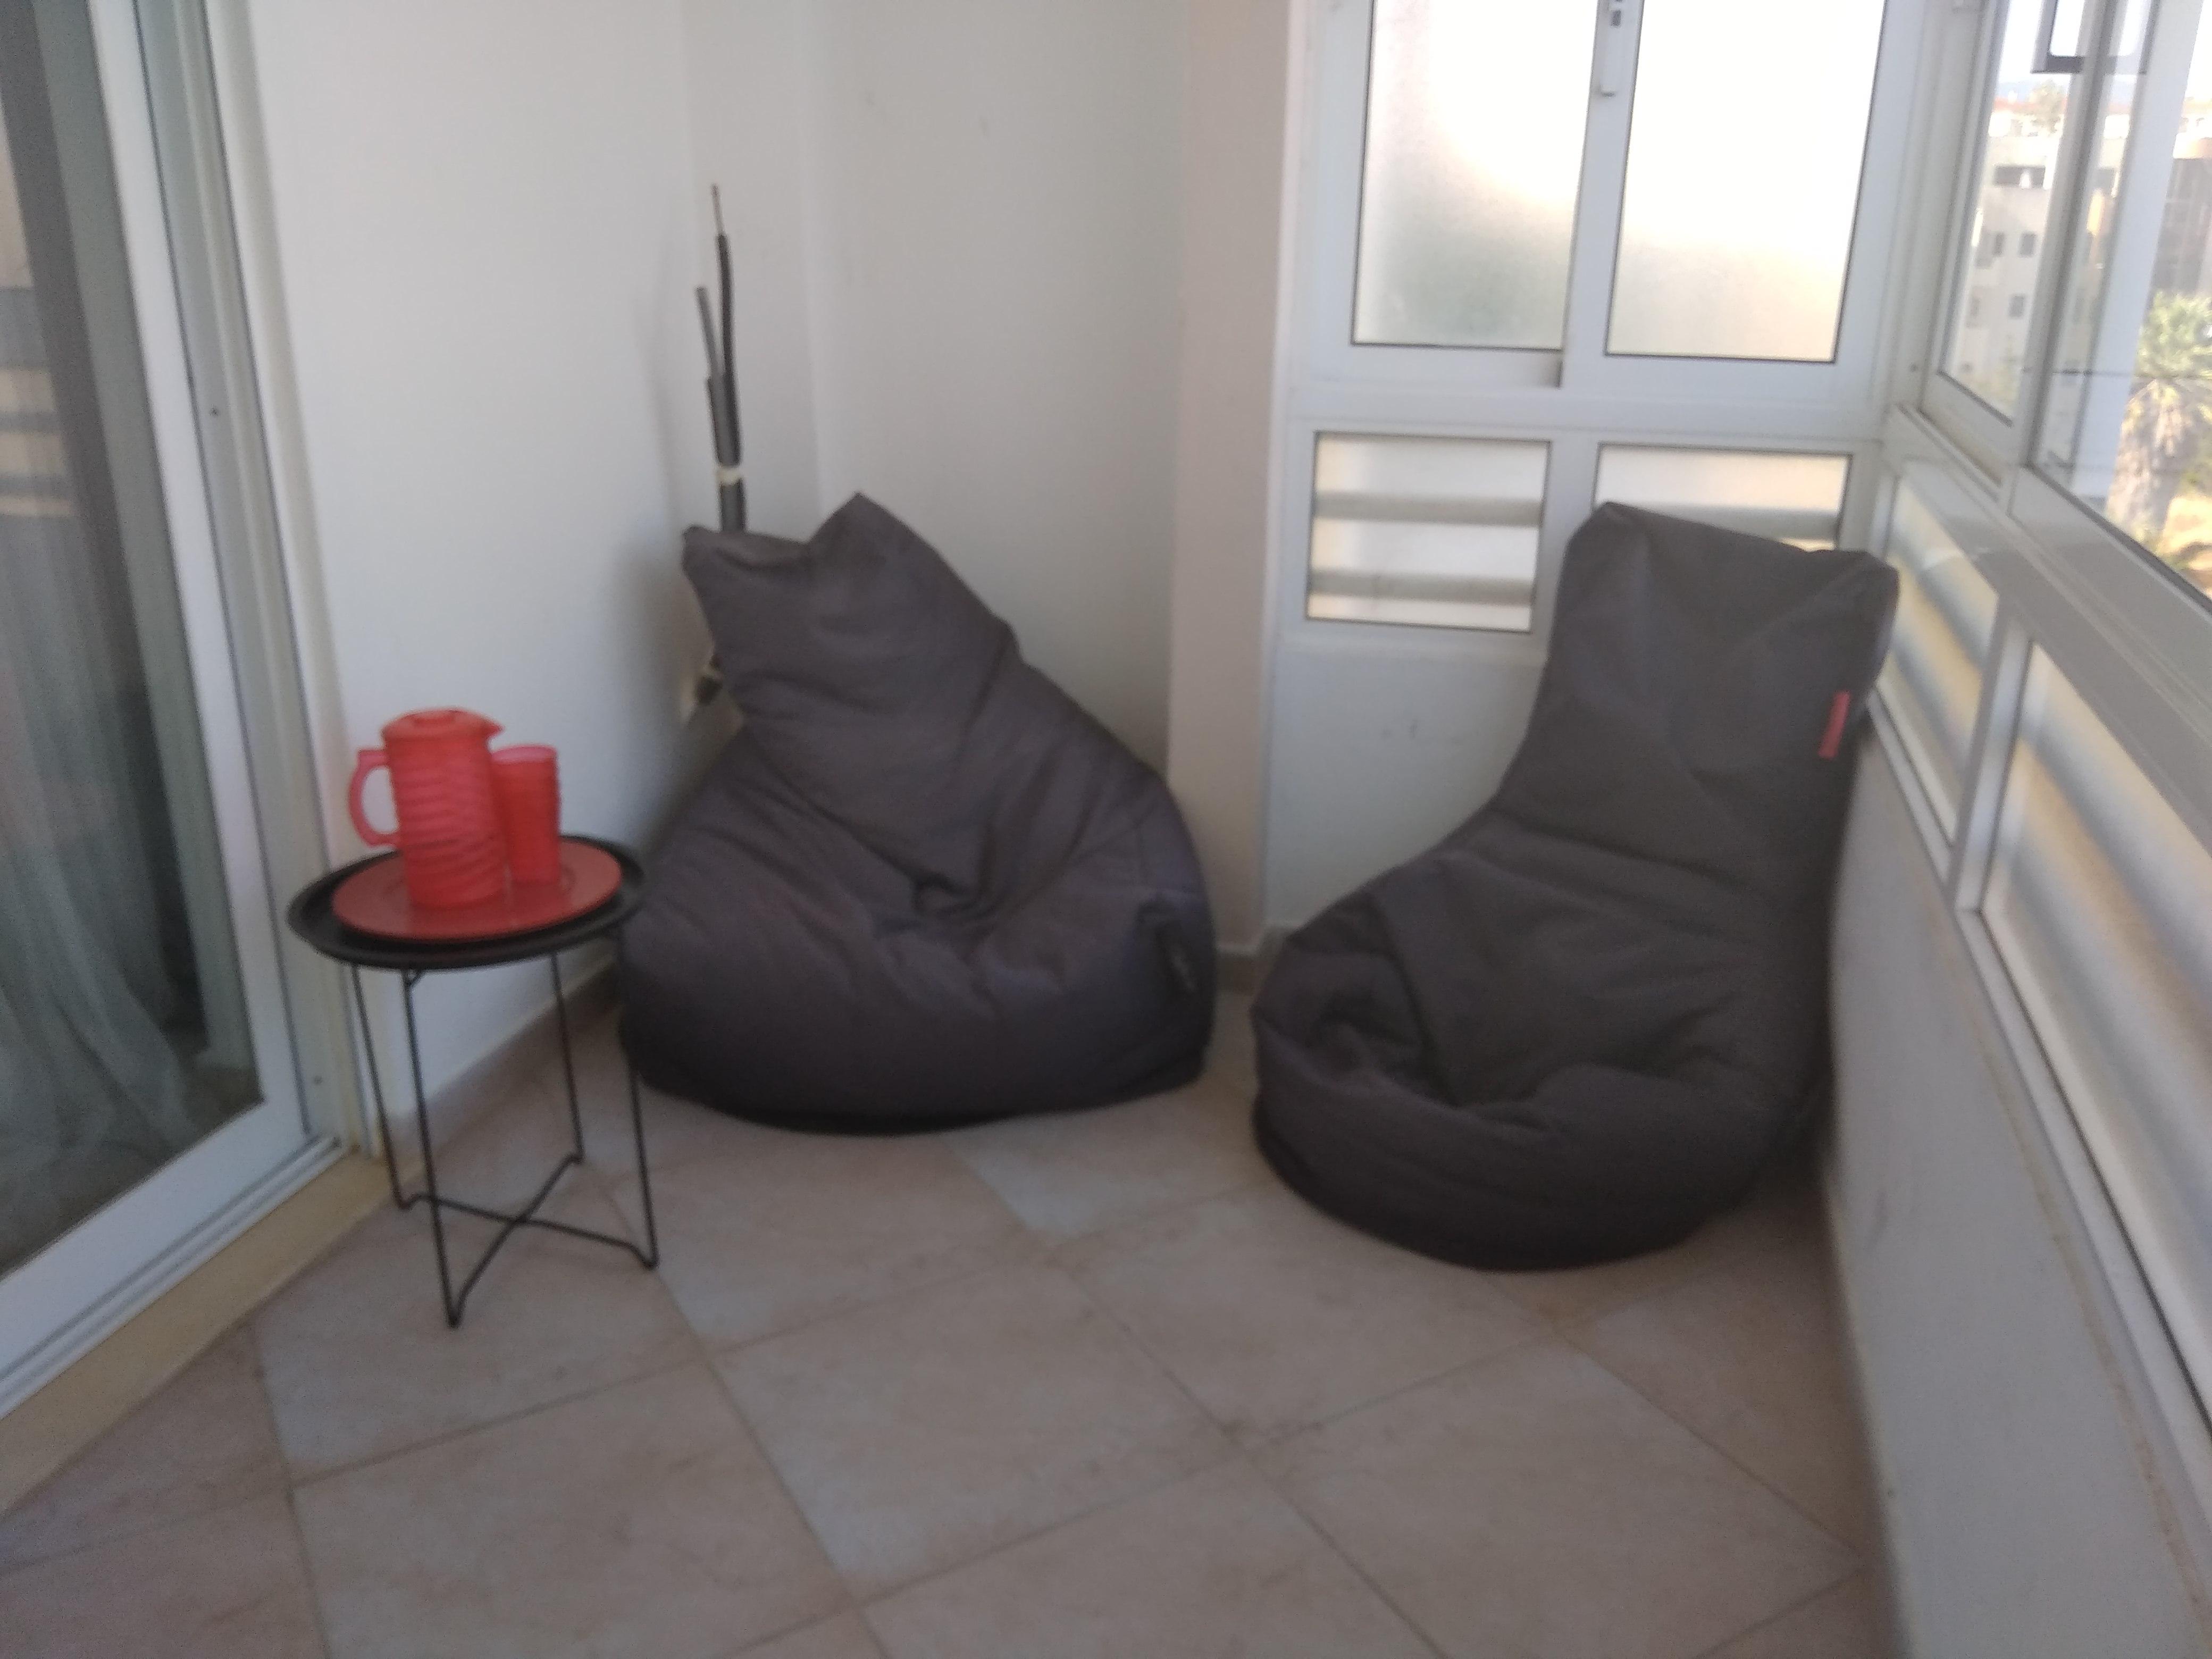 Location appartements et villas de vacance, T2 Sunny Apartment With Panoramic View à Portimão, Portugal Algarve, REF_IMG_5745_5757